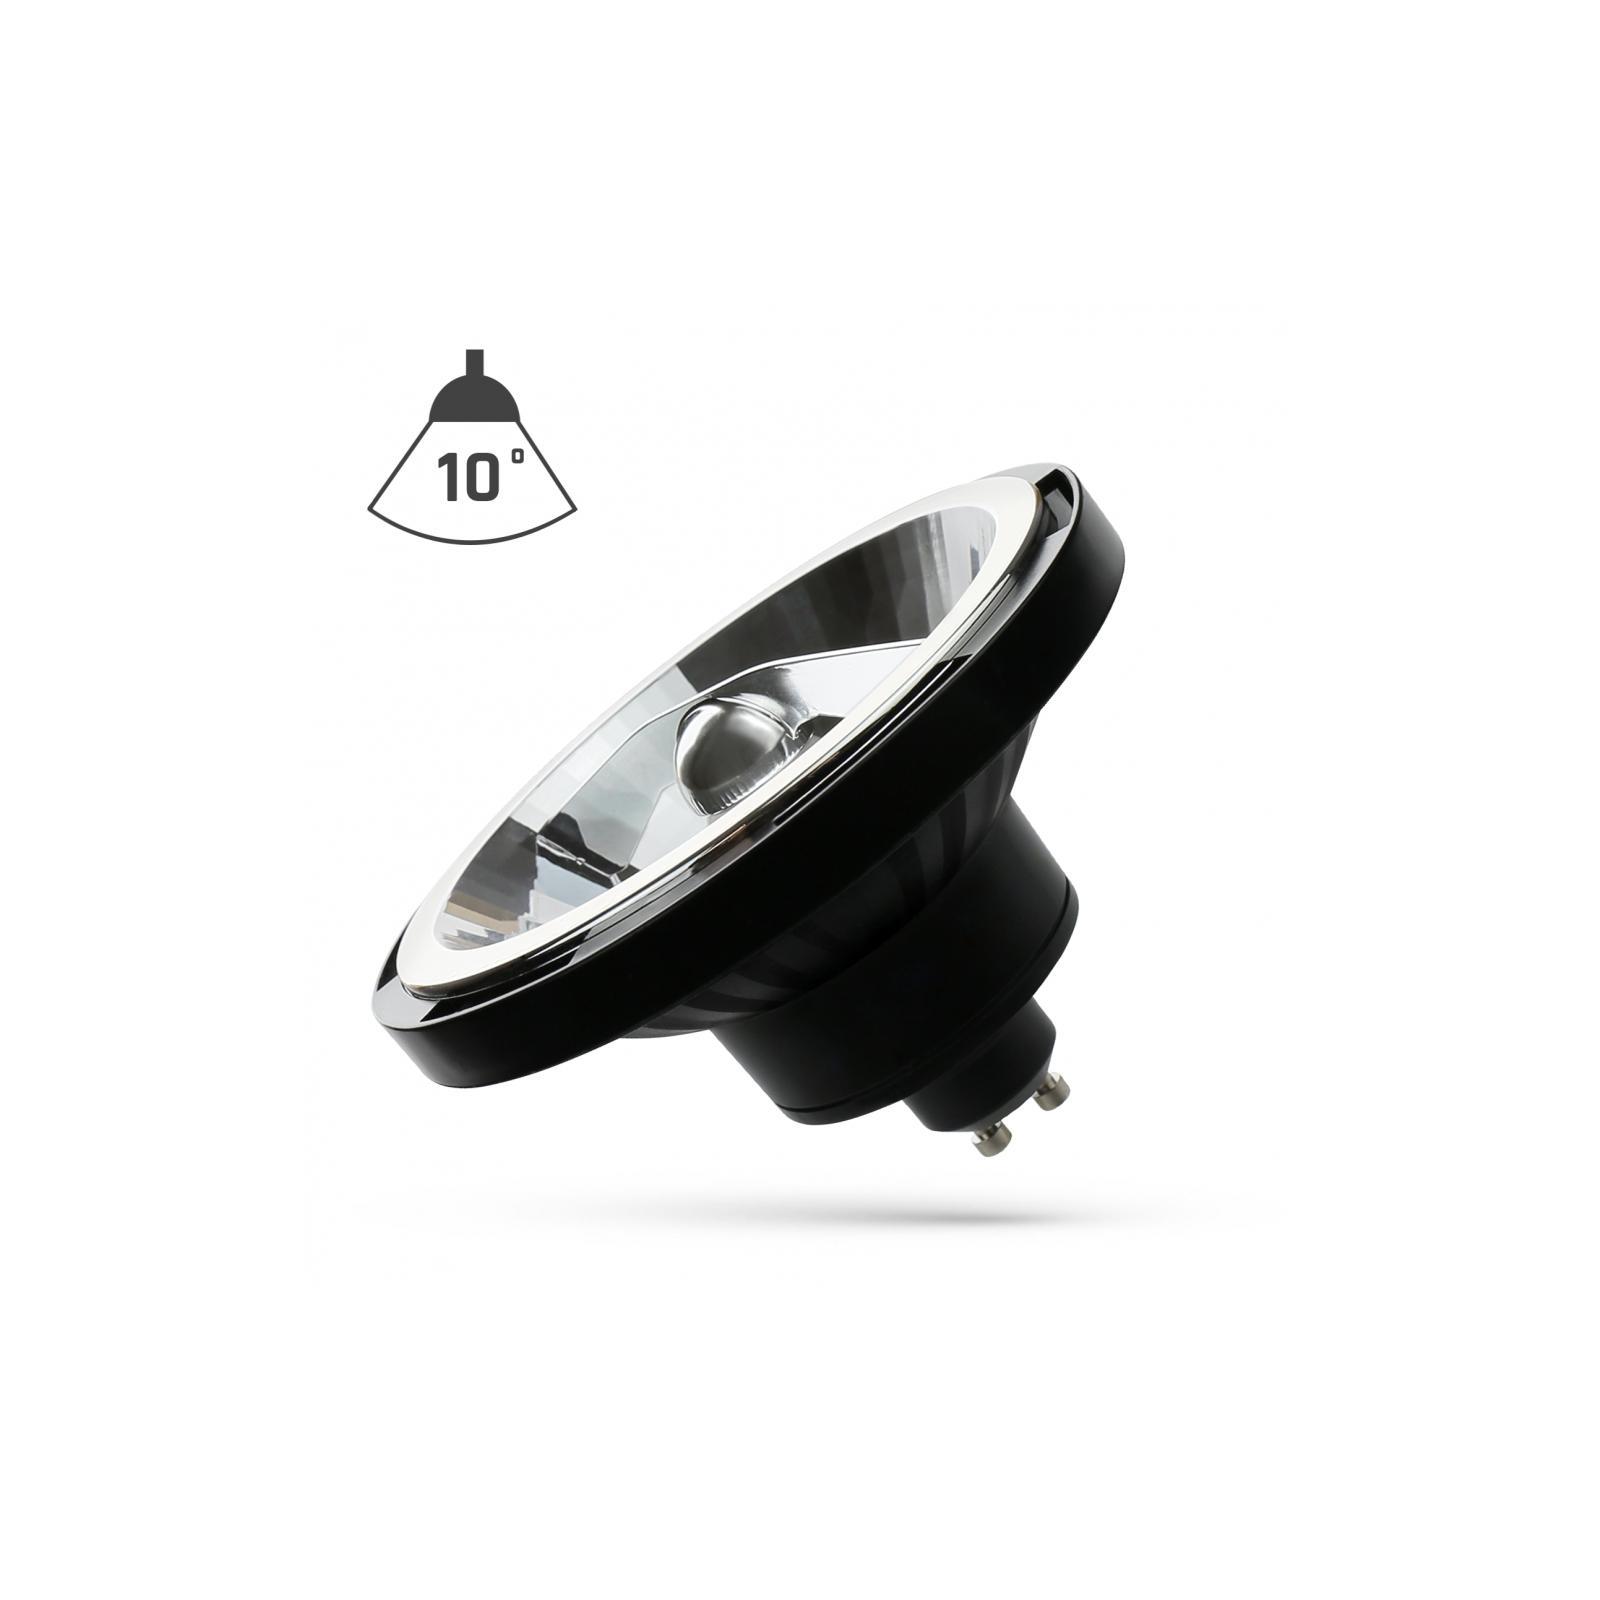 LED AR111 GU10 230V 15W COB 10ST Neutrální bílá Černá SPECTRUM